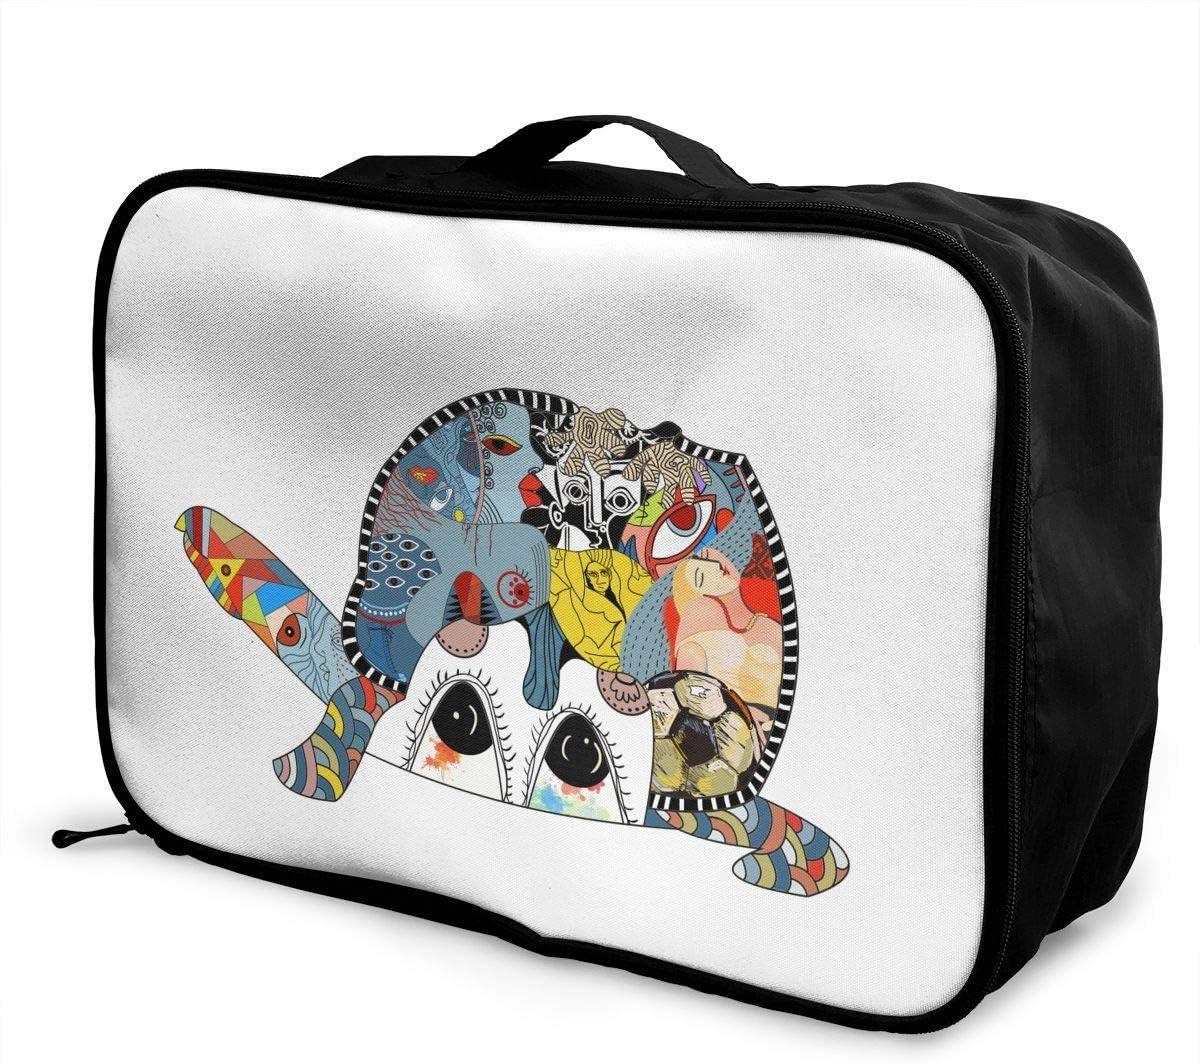 Turtle Duffle Bag Large Sea Turtle Gym Bags